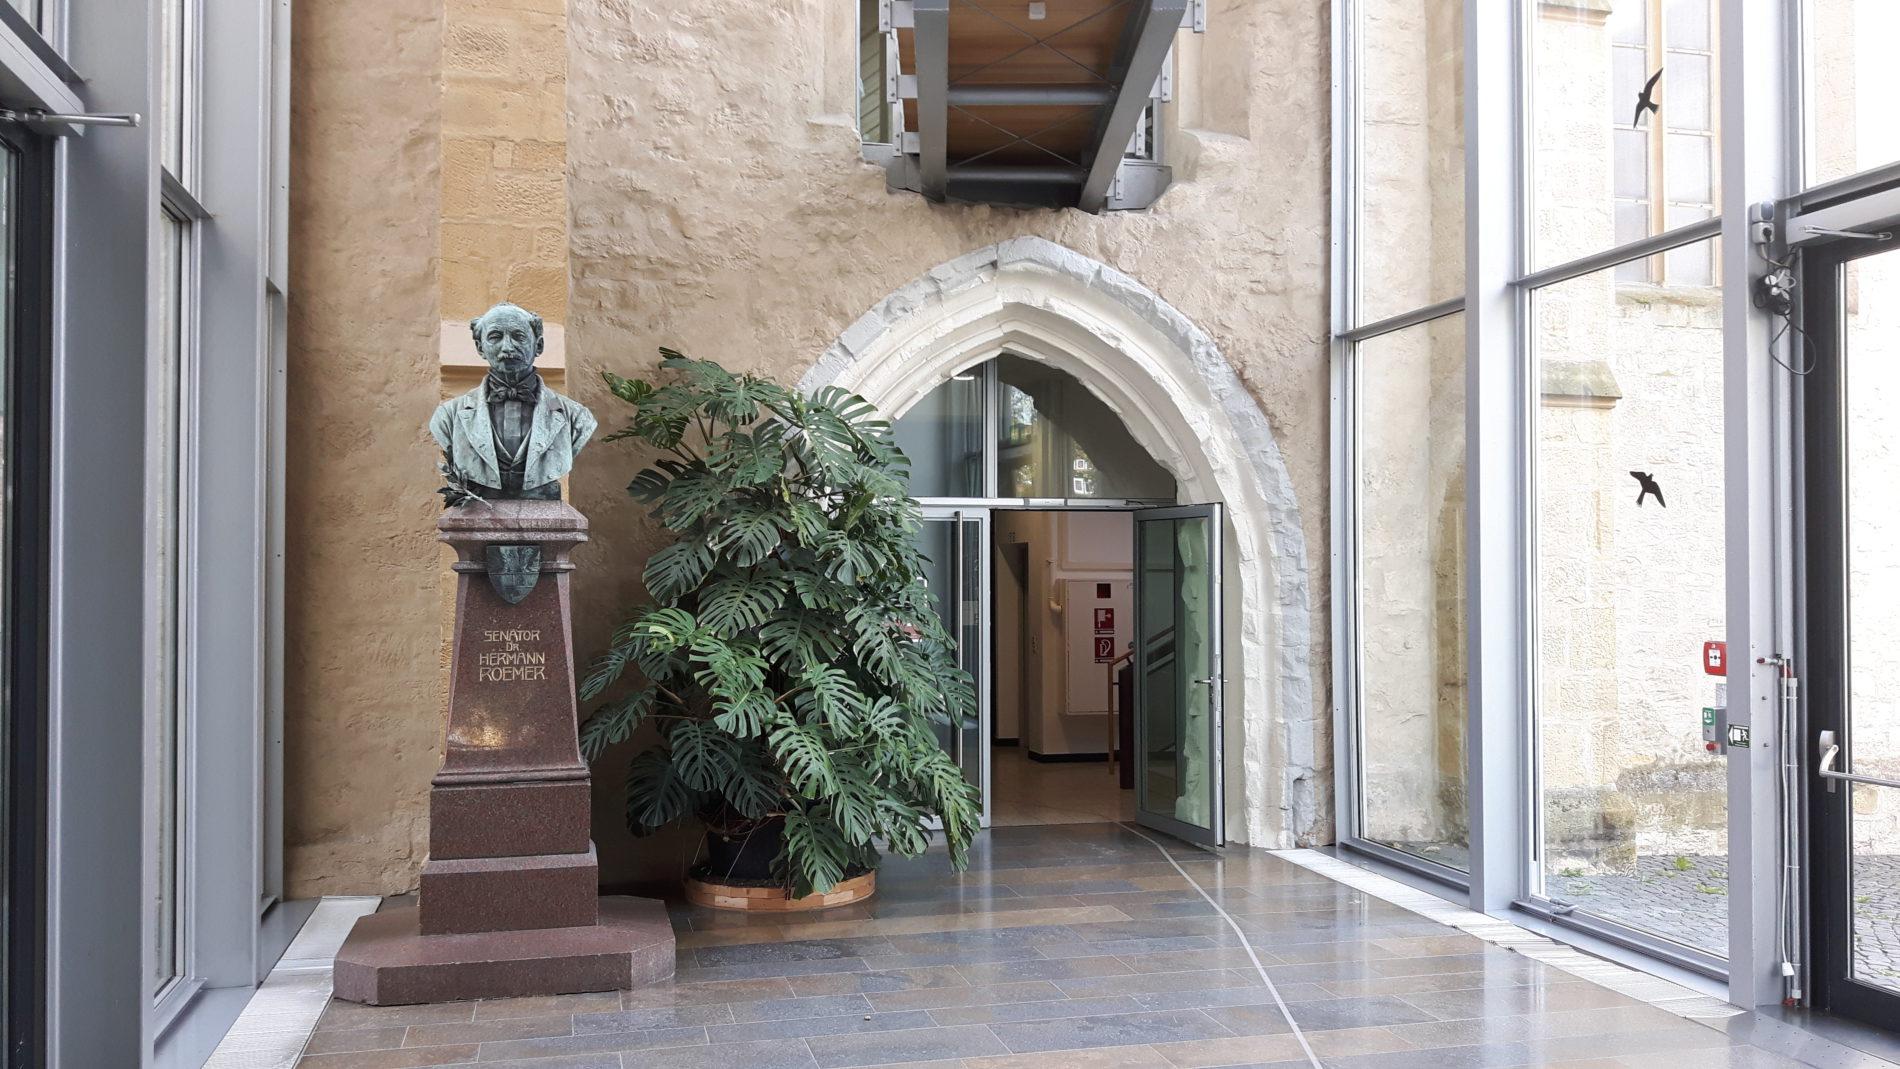 Die Büste des Museumsbegründers Hermann Roemer (c) Keno Hennecke